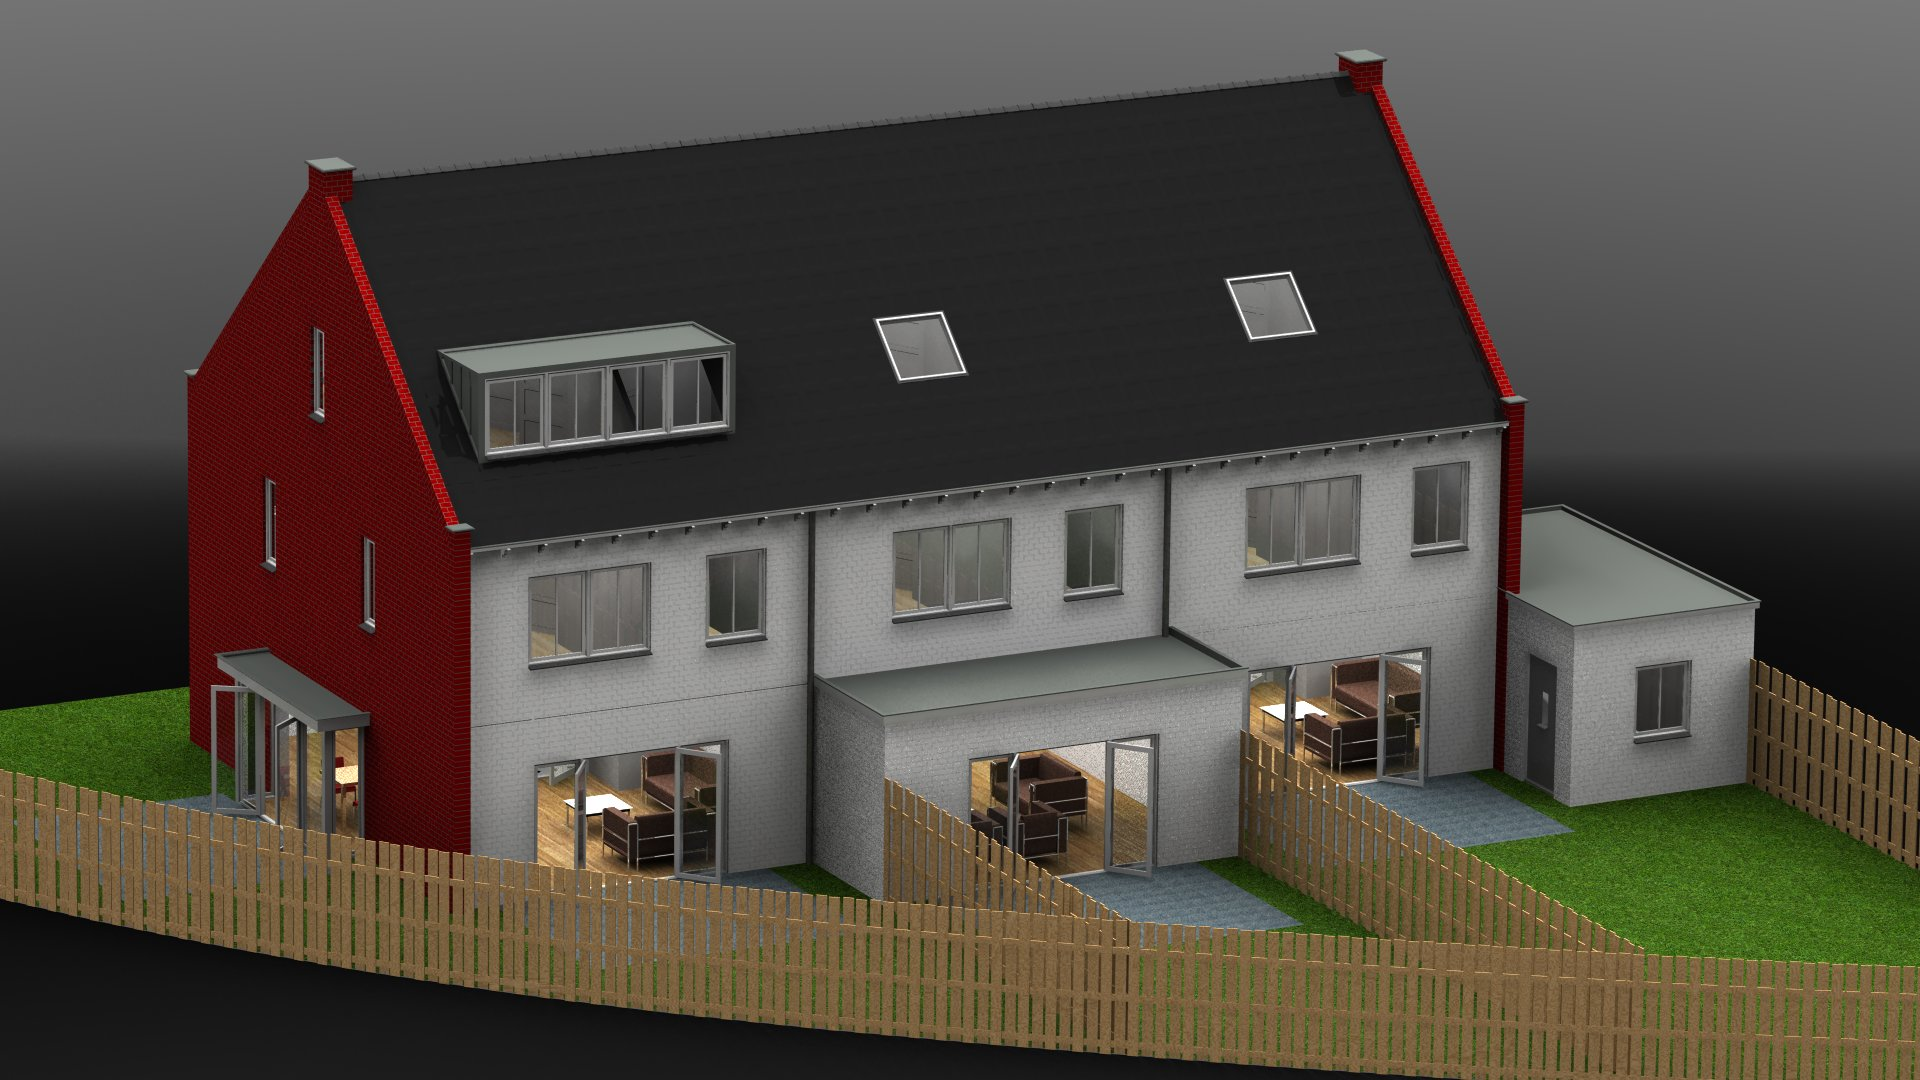 Huizenblok achterkant